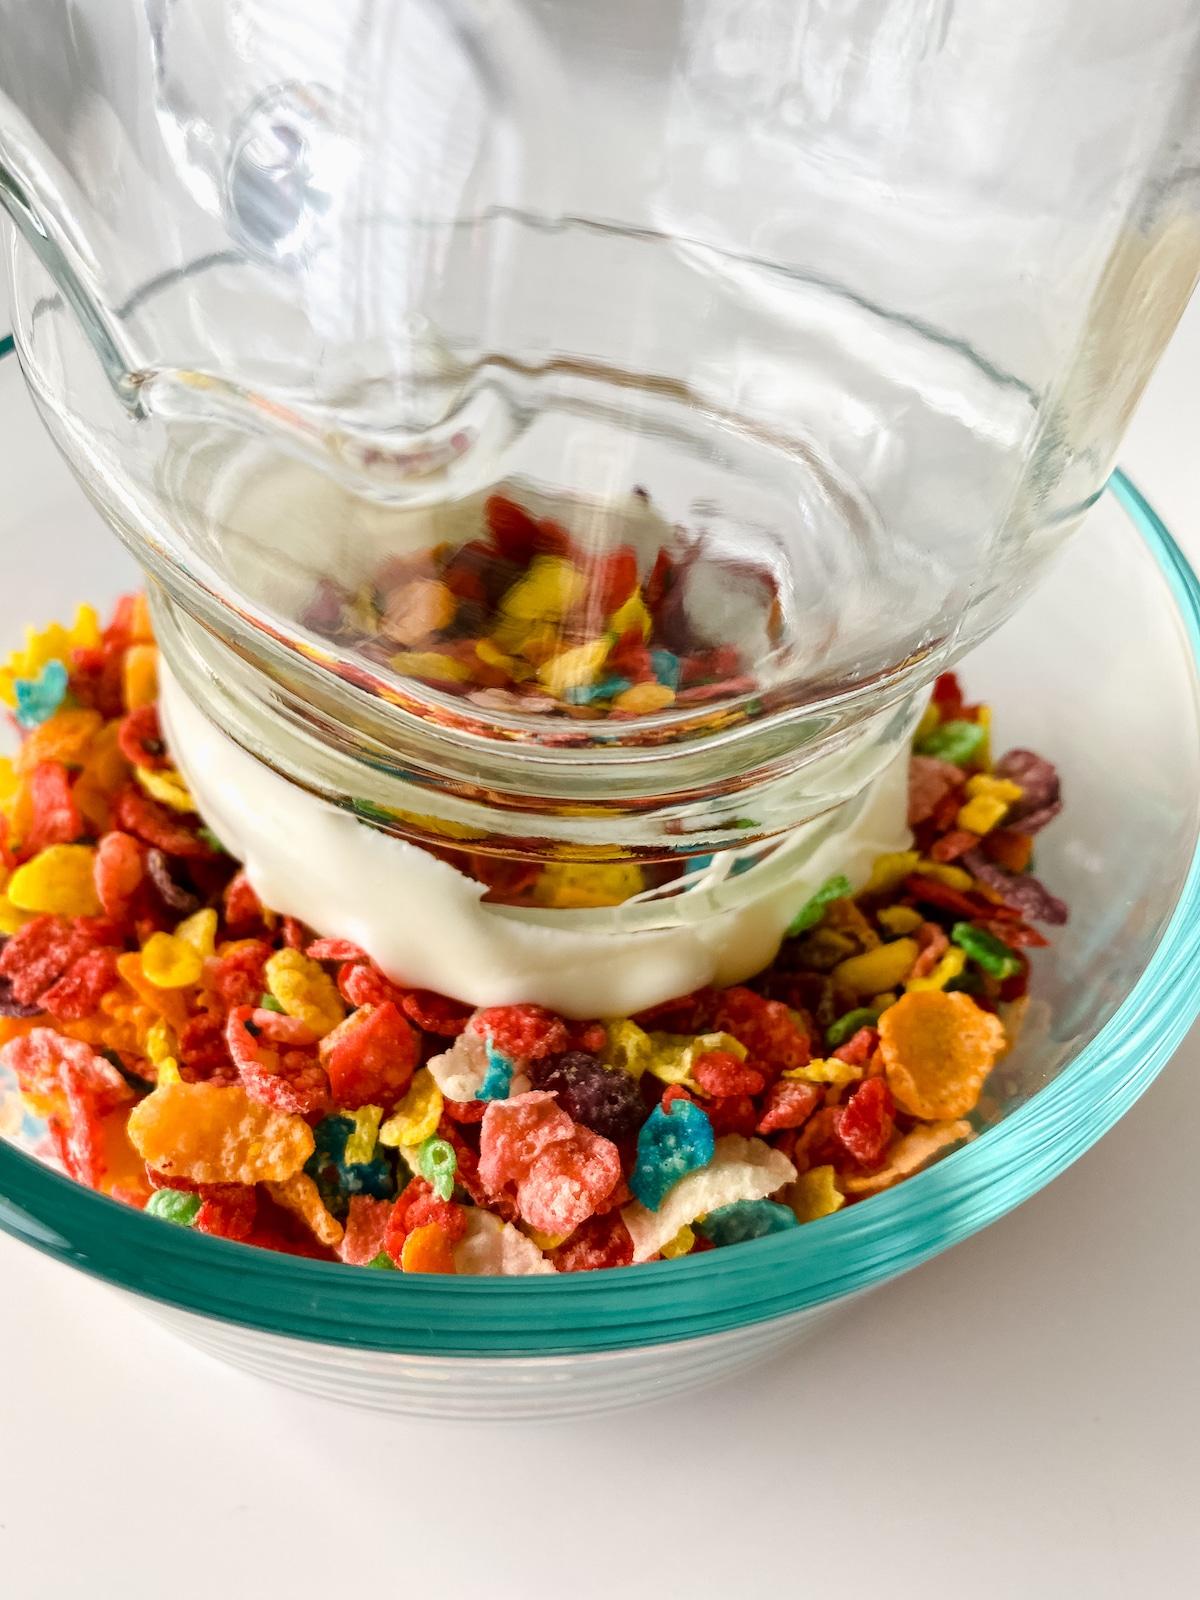 Dipping mug rim into bowl of cereal